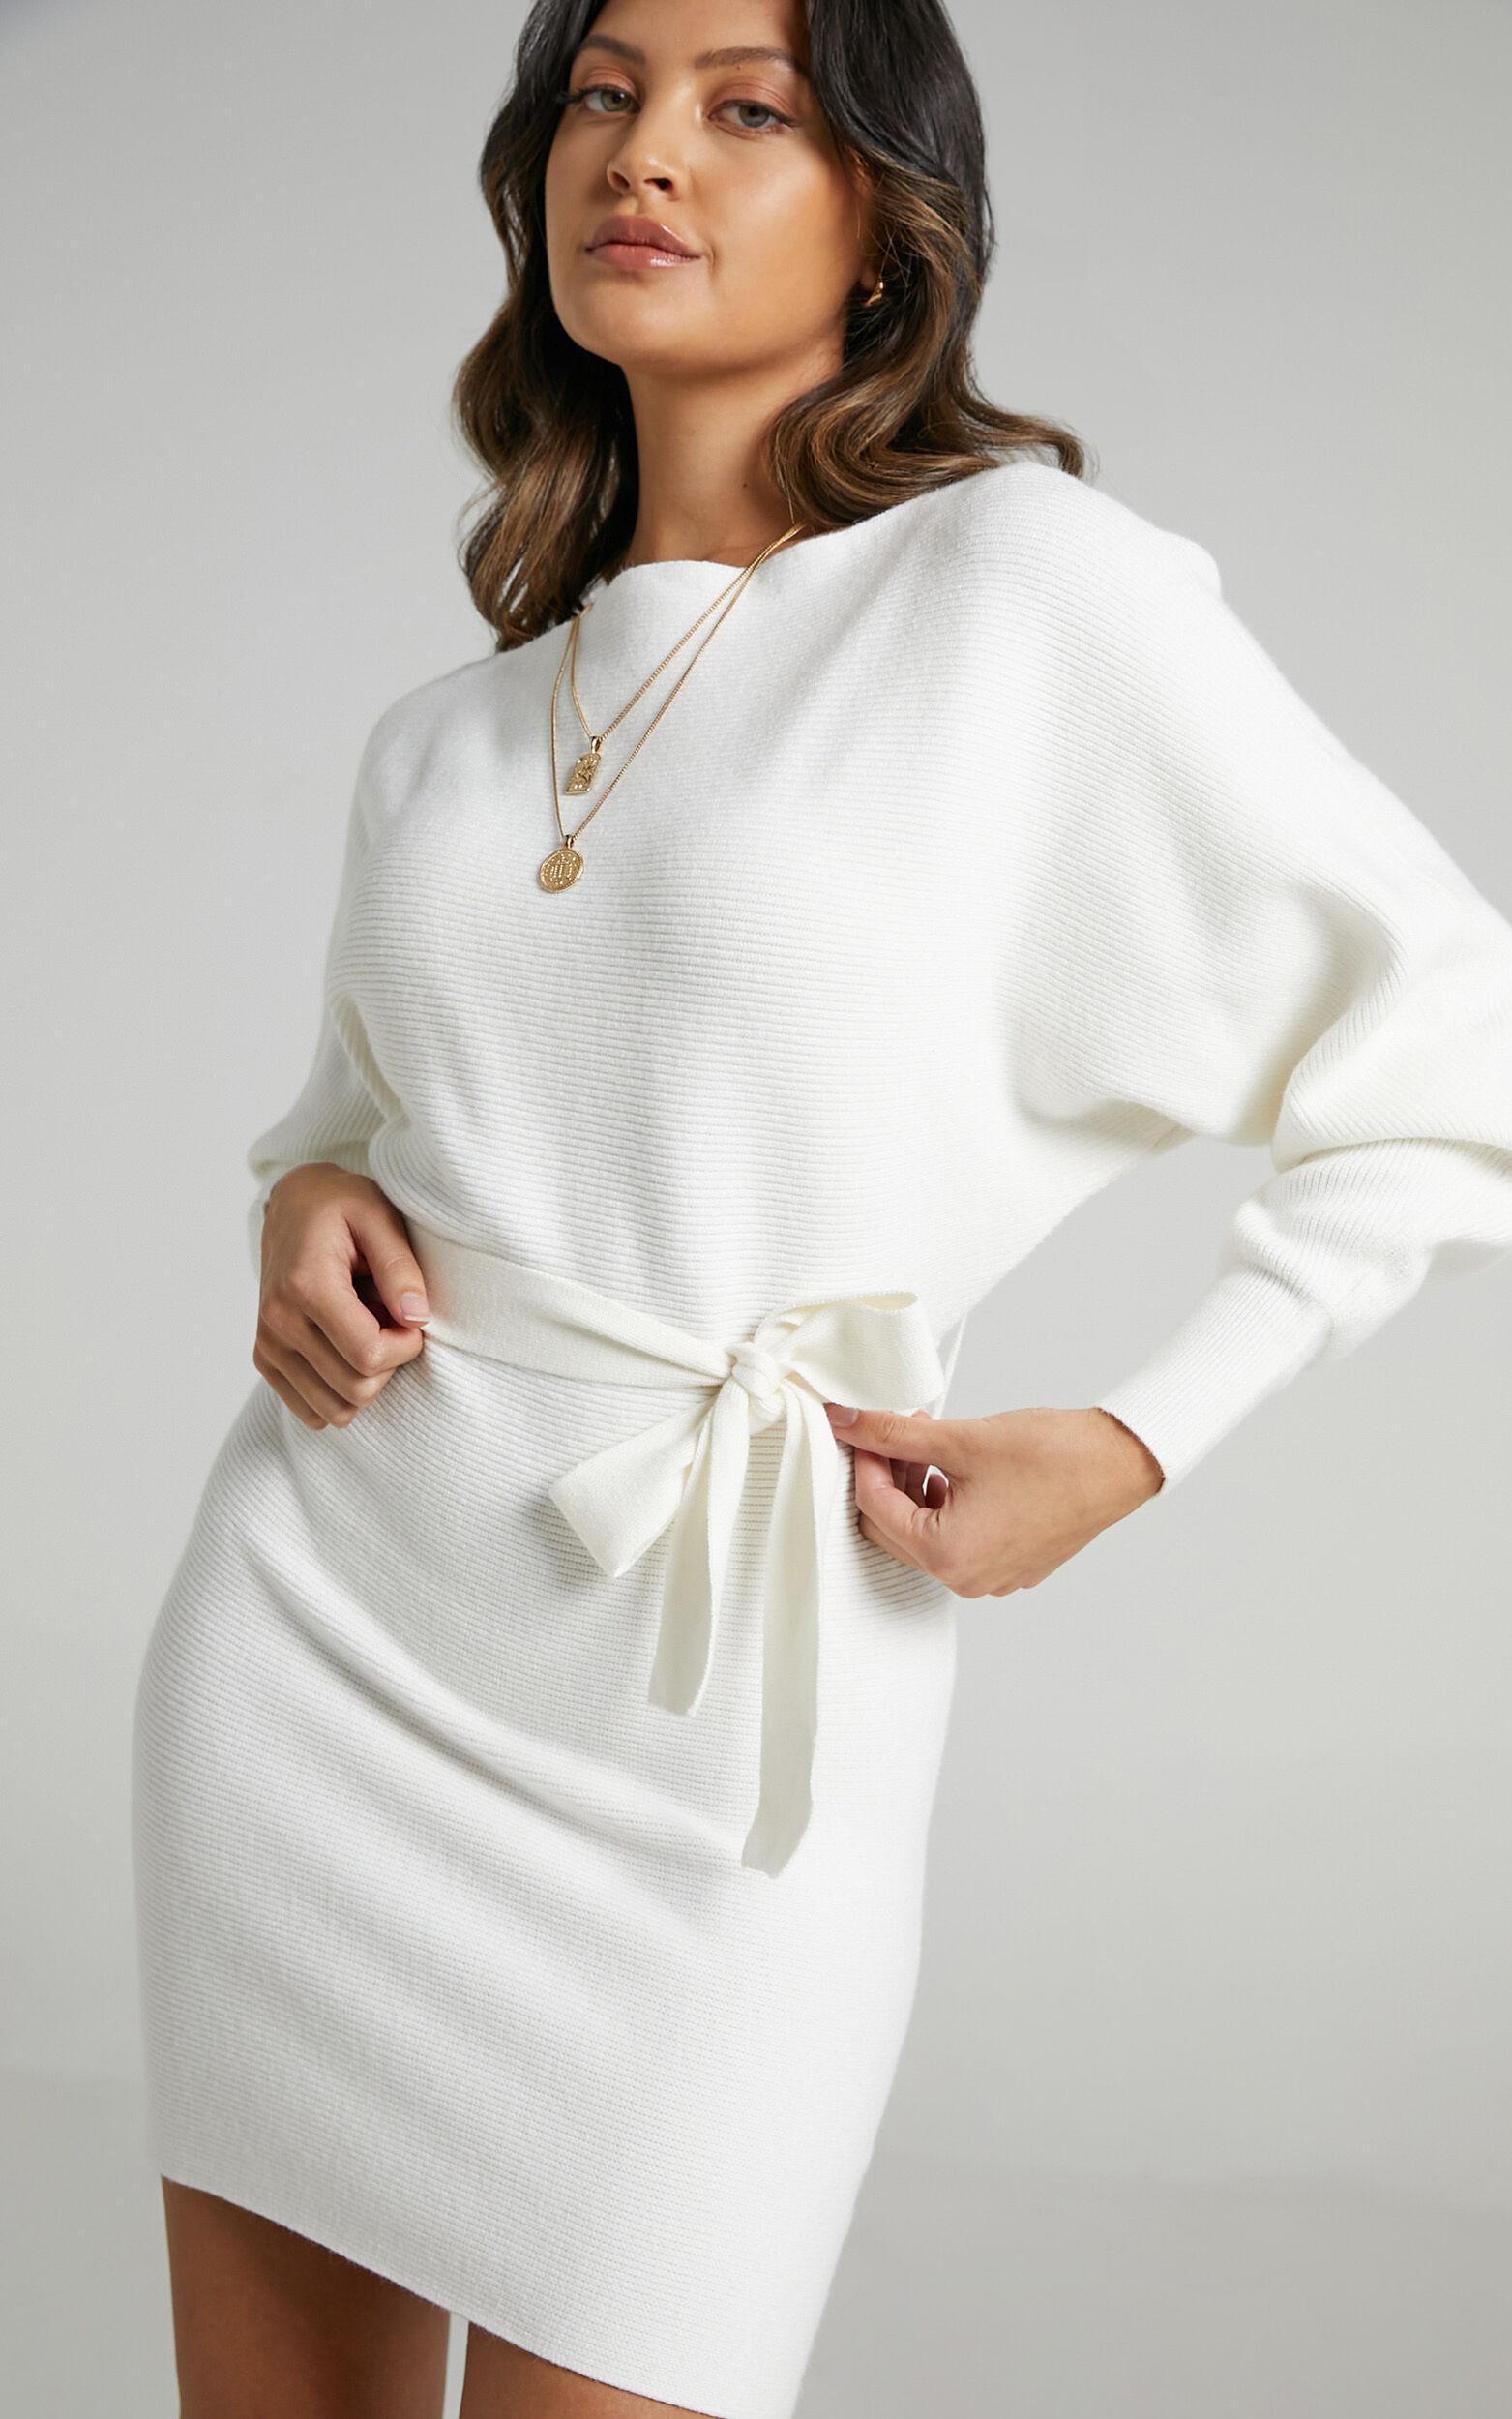 La Fleur Long Sleeve Knit Dress in Cream - 06, CRE2, super-hi-res image number null